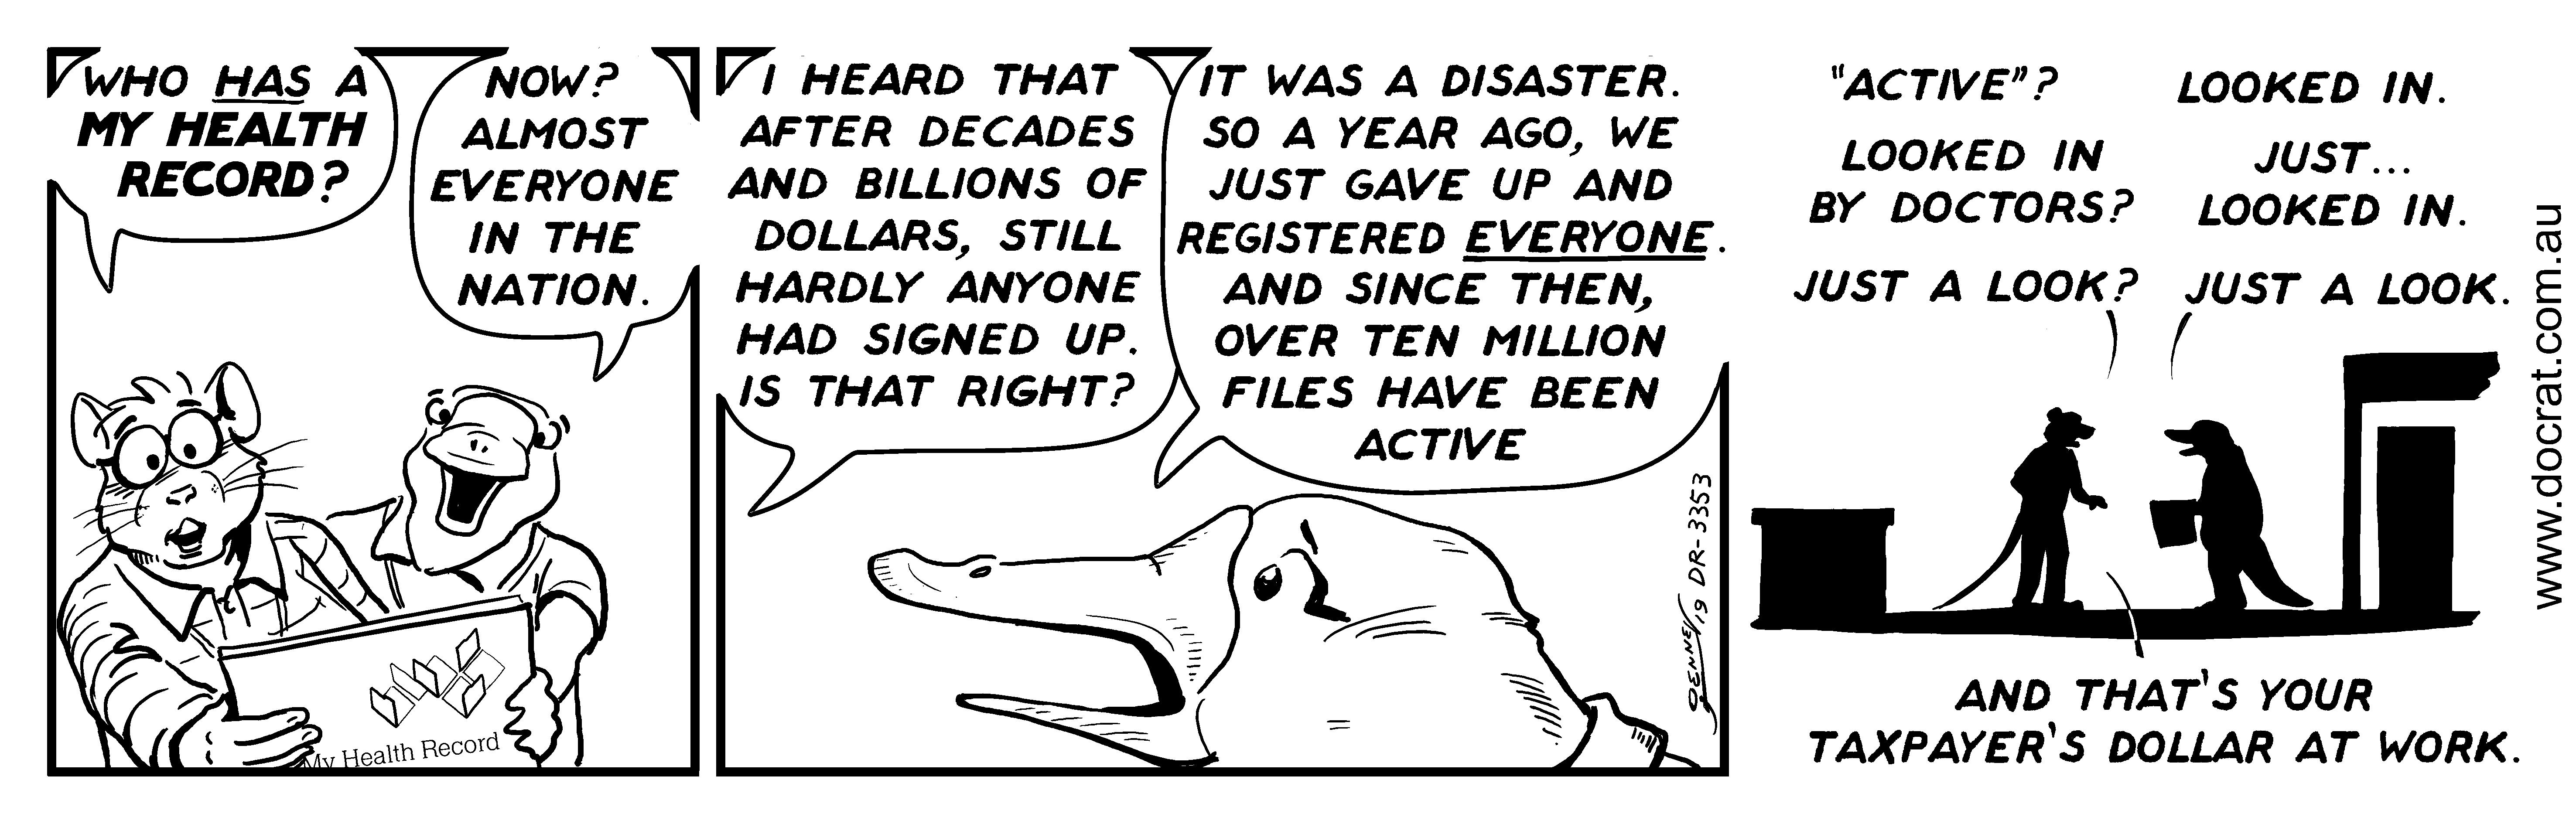 20191016